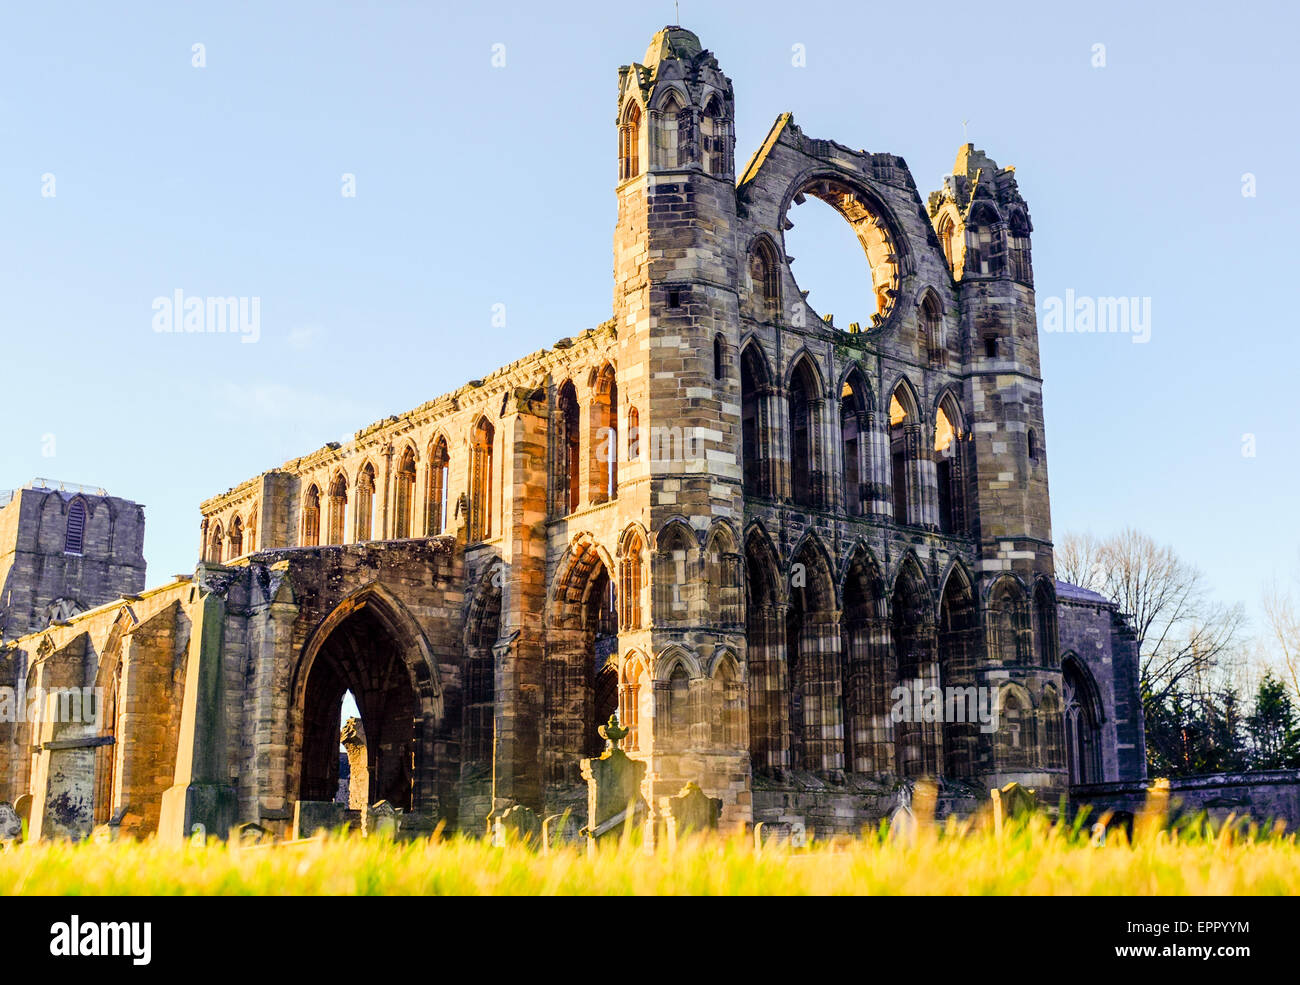 Elgin Cathedral at sunset in Elgin, Scotland, Moray, Morayshire. - Stock Image